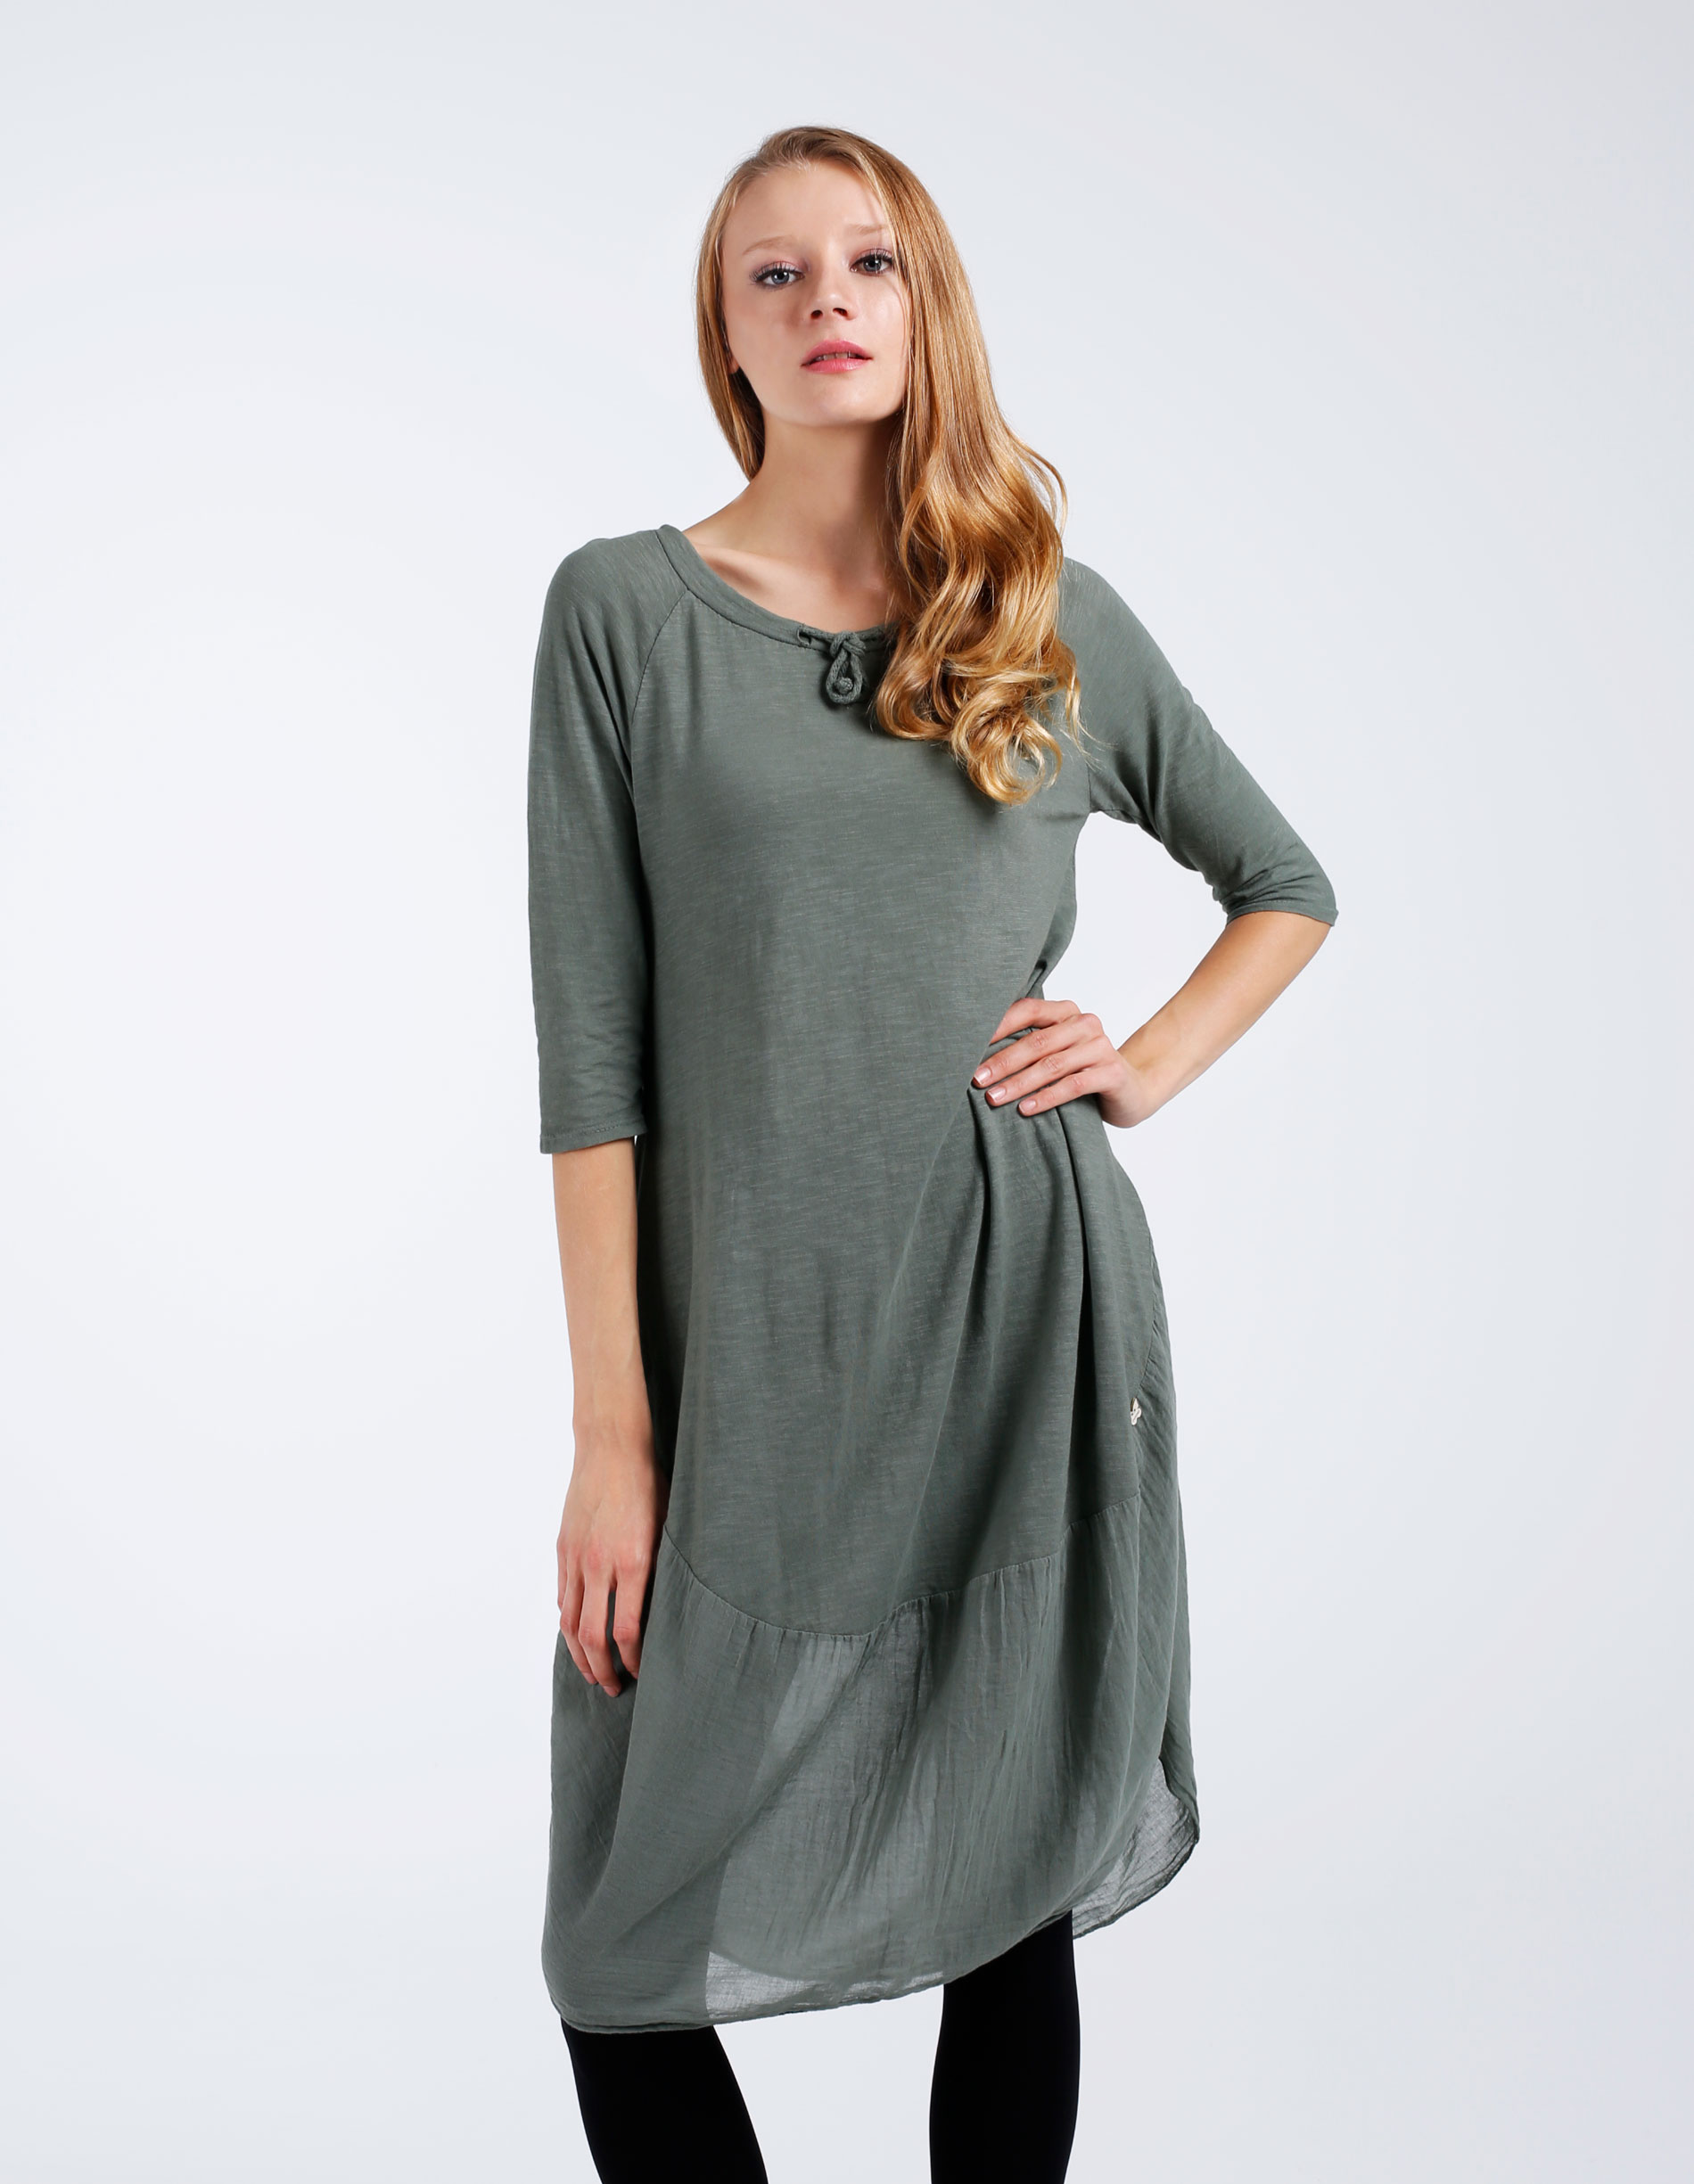 Sukienka - 18-17109 MILI - Unisono